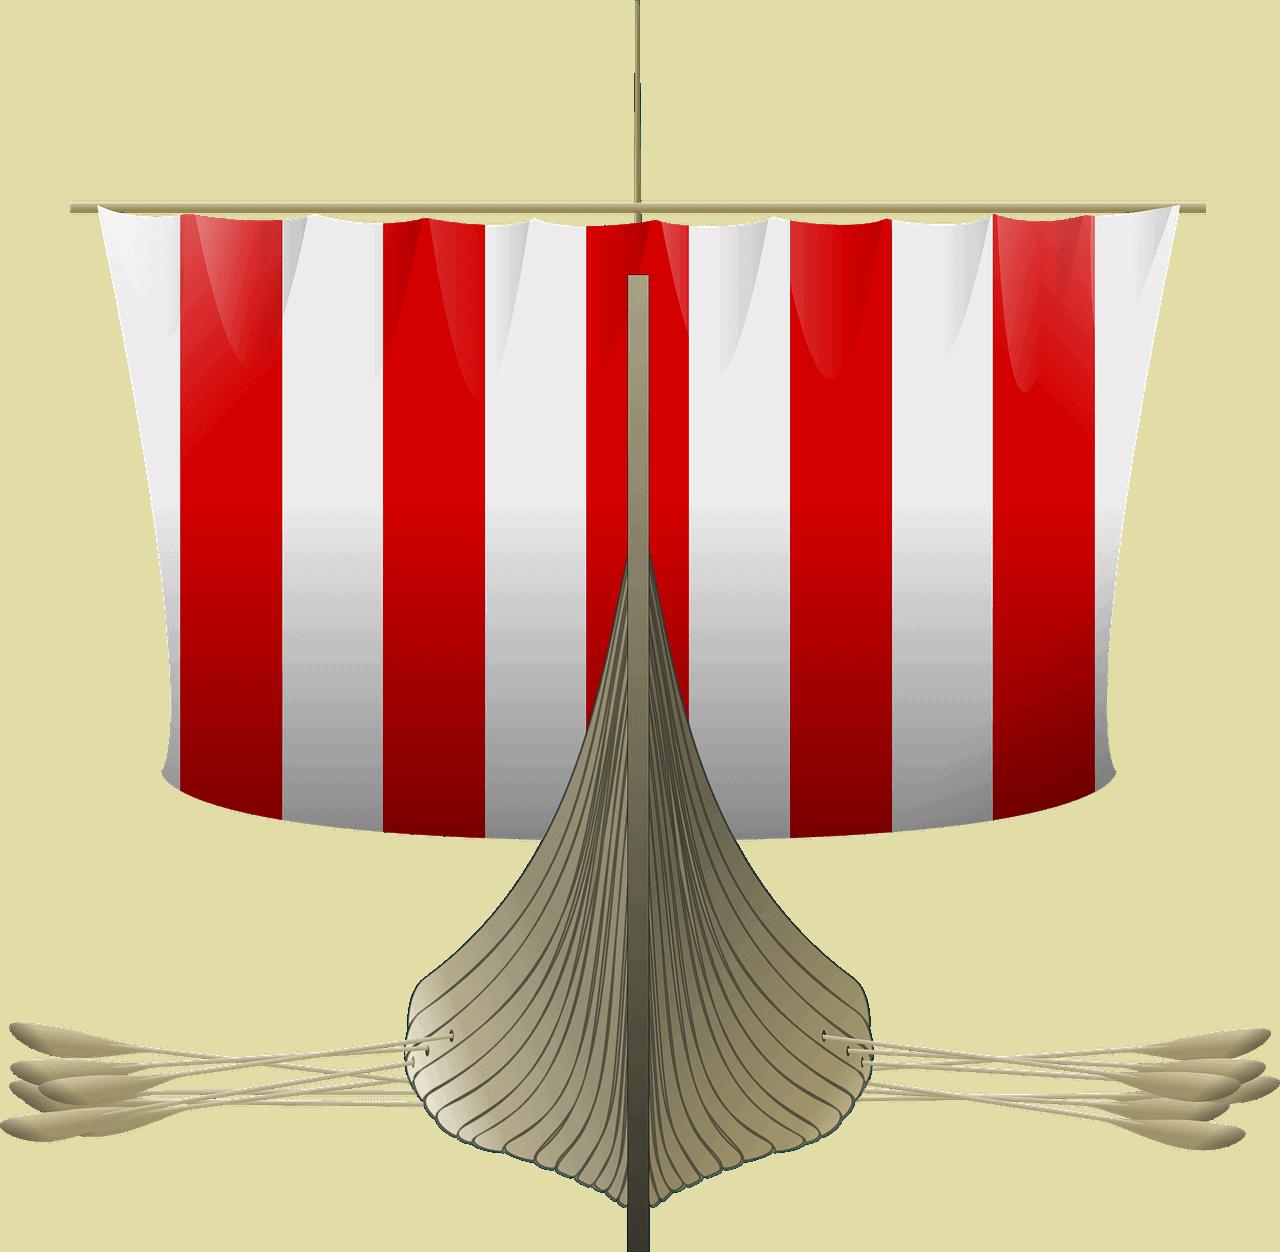 Vilking ship